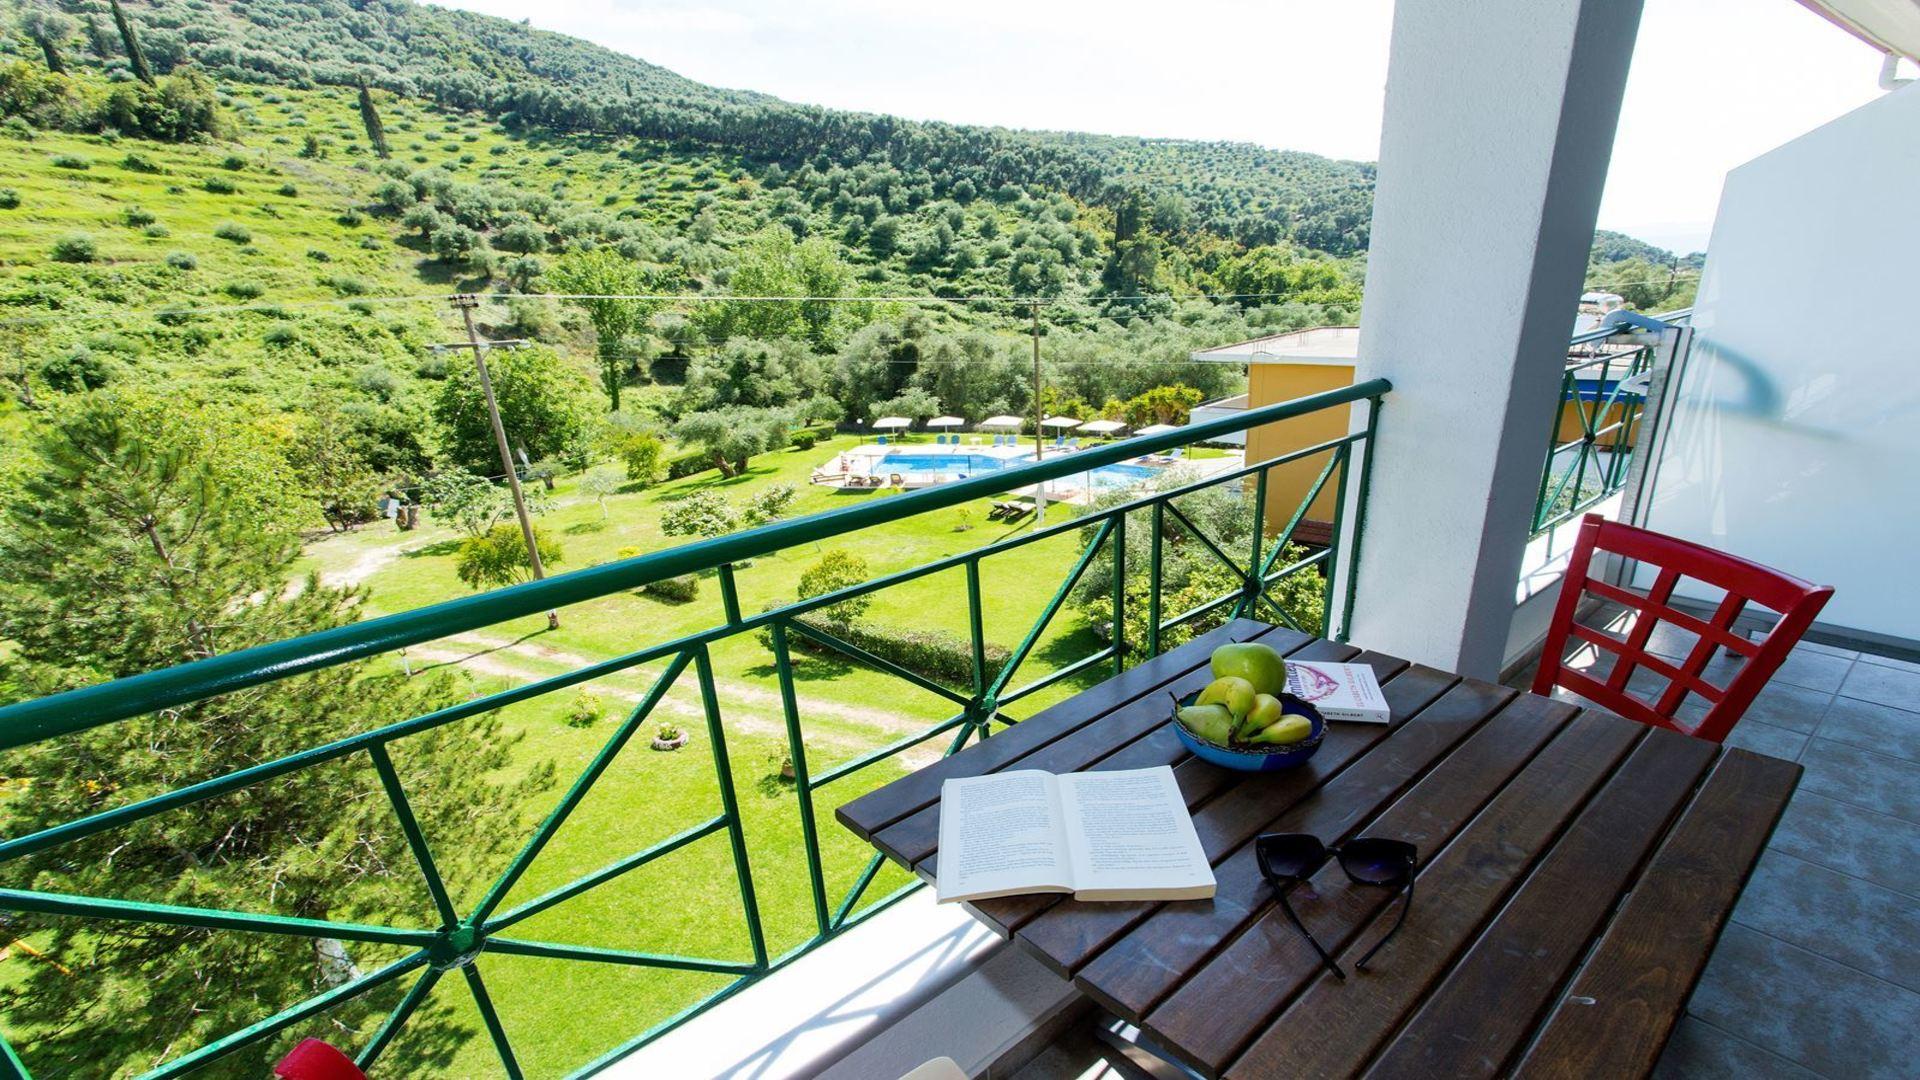 Balkon van studio in Aristidis Garden, Parga, Epirus, Griekenland